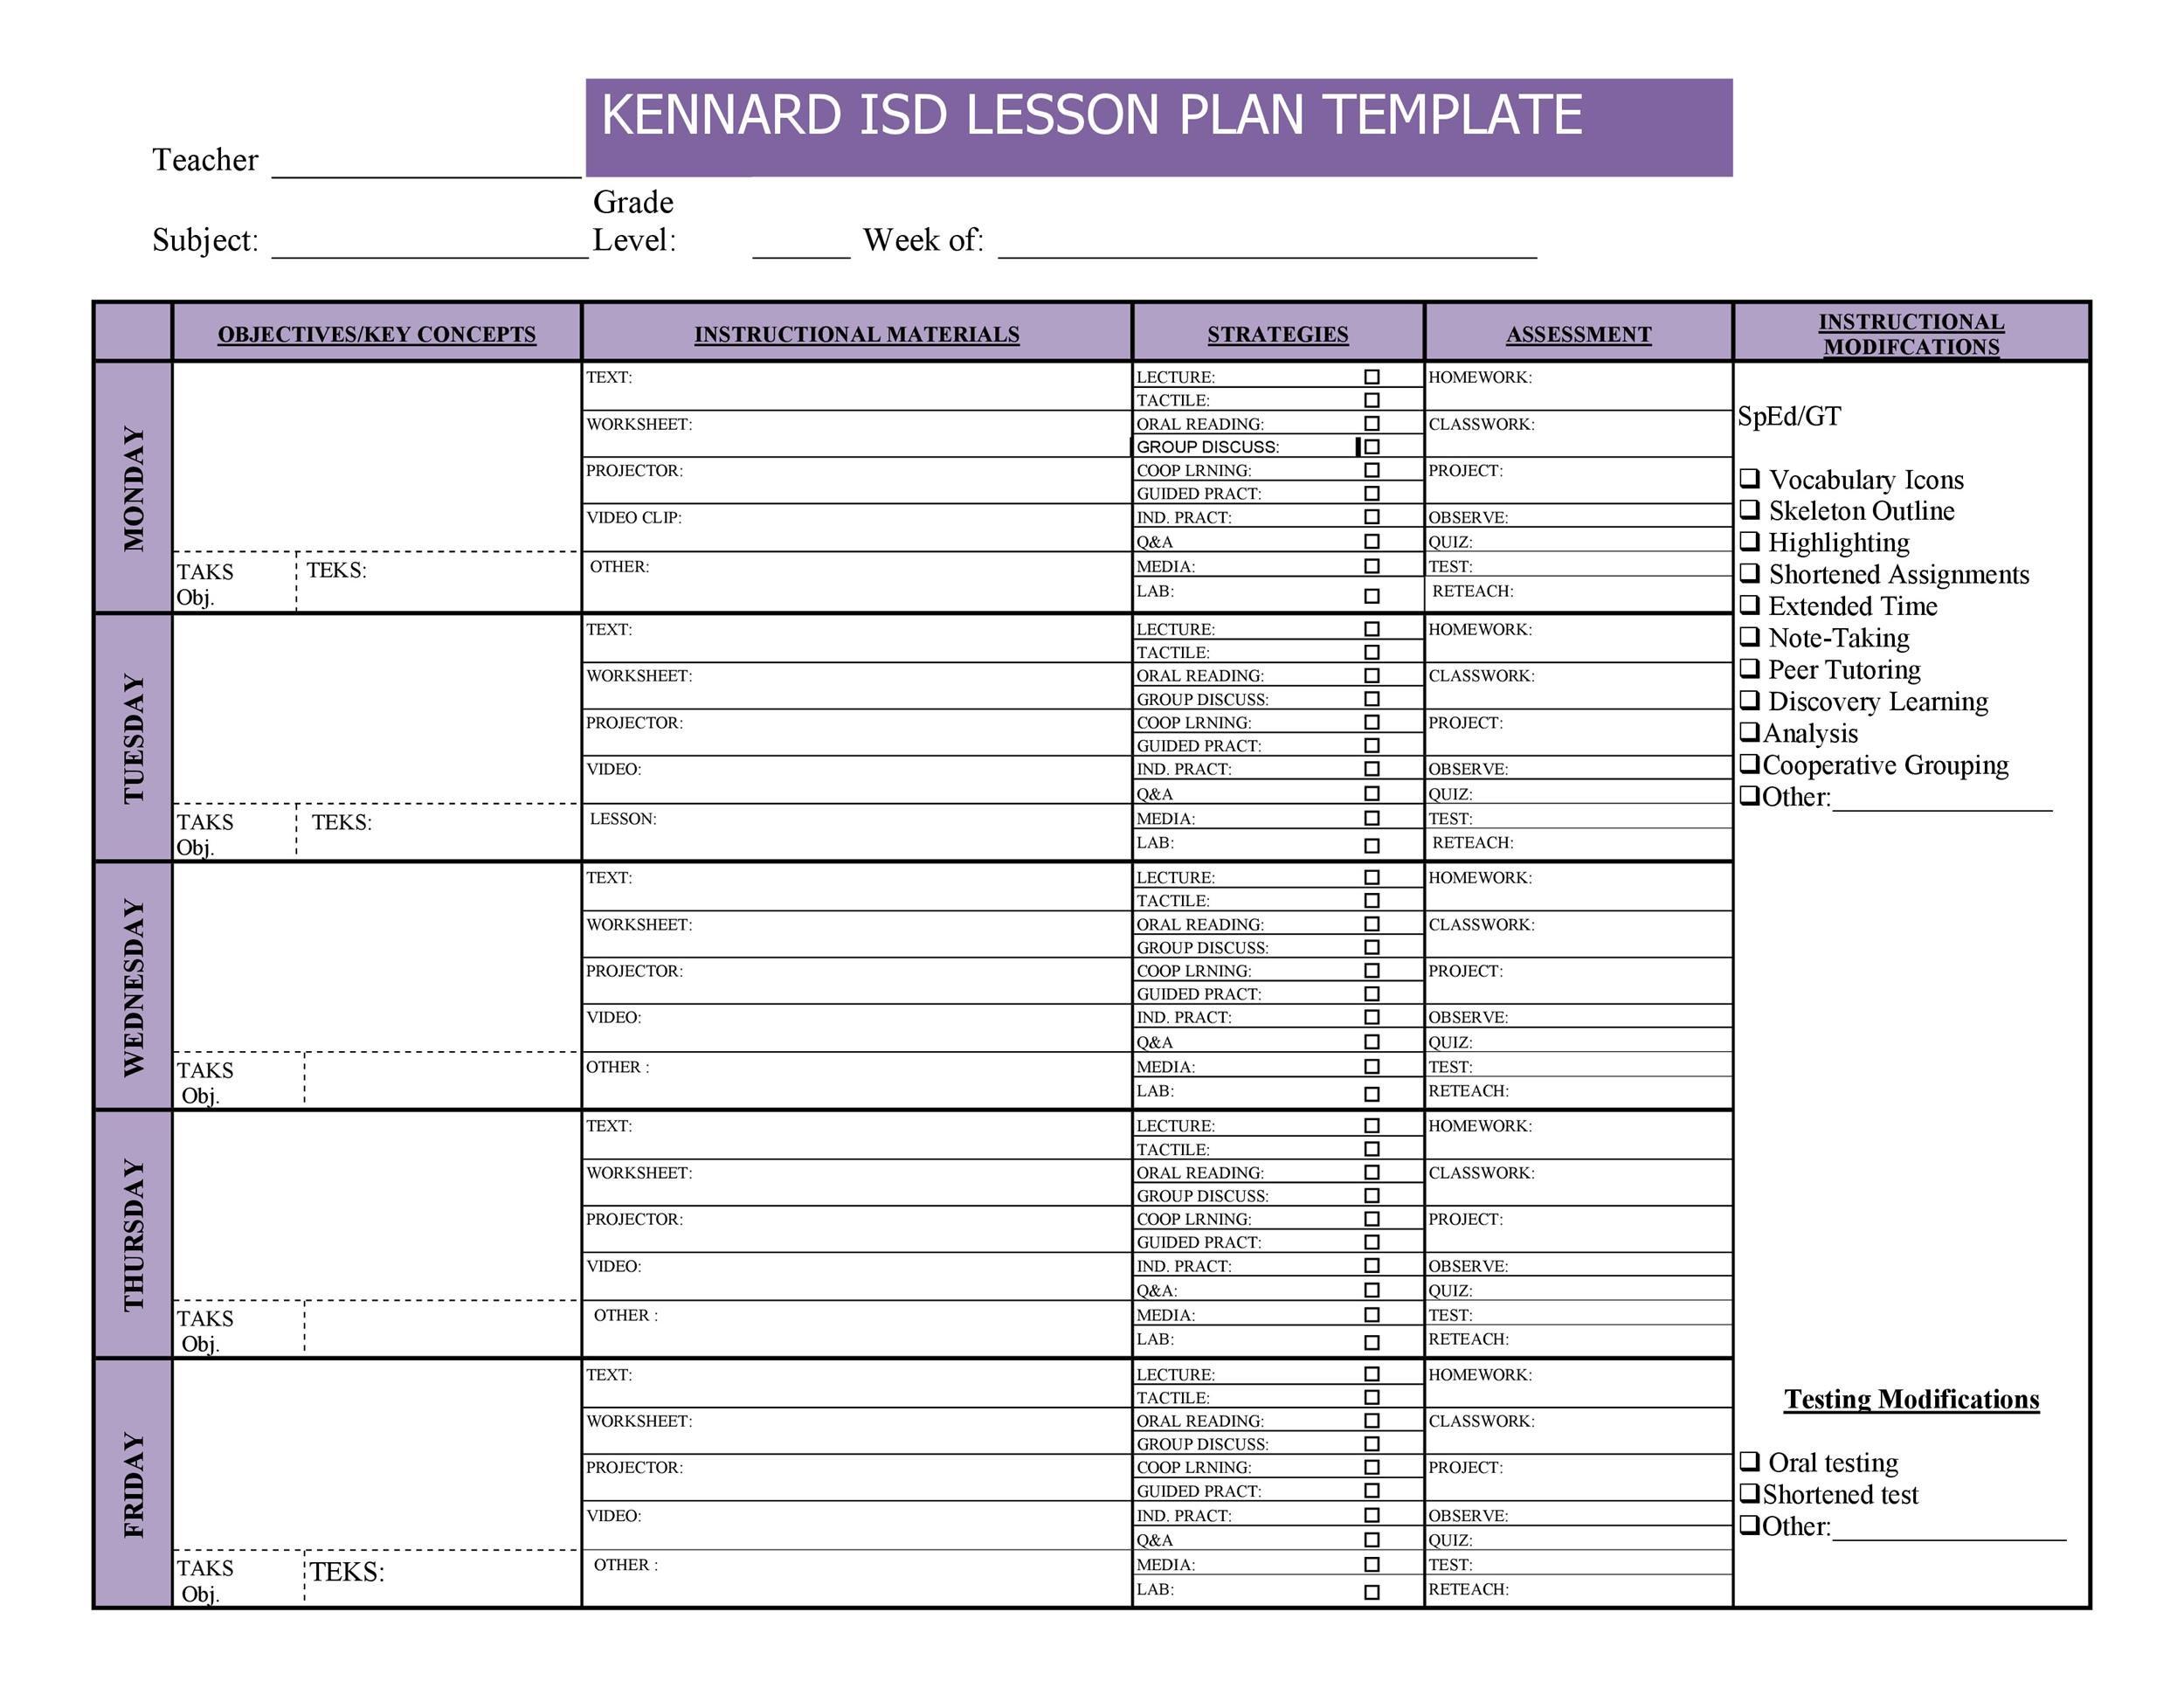 44 Free Lesson Plan Templates [Common Core, Preschool, Weekly] Lesson Plan Template Weekly Prescool Plannar